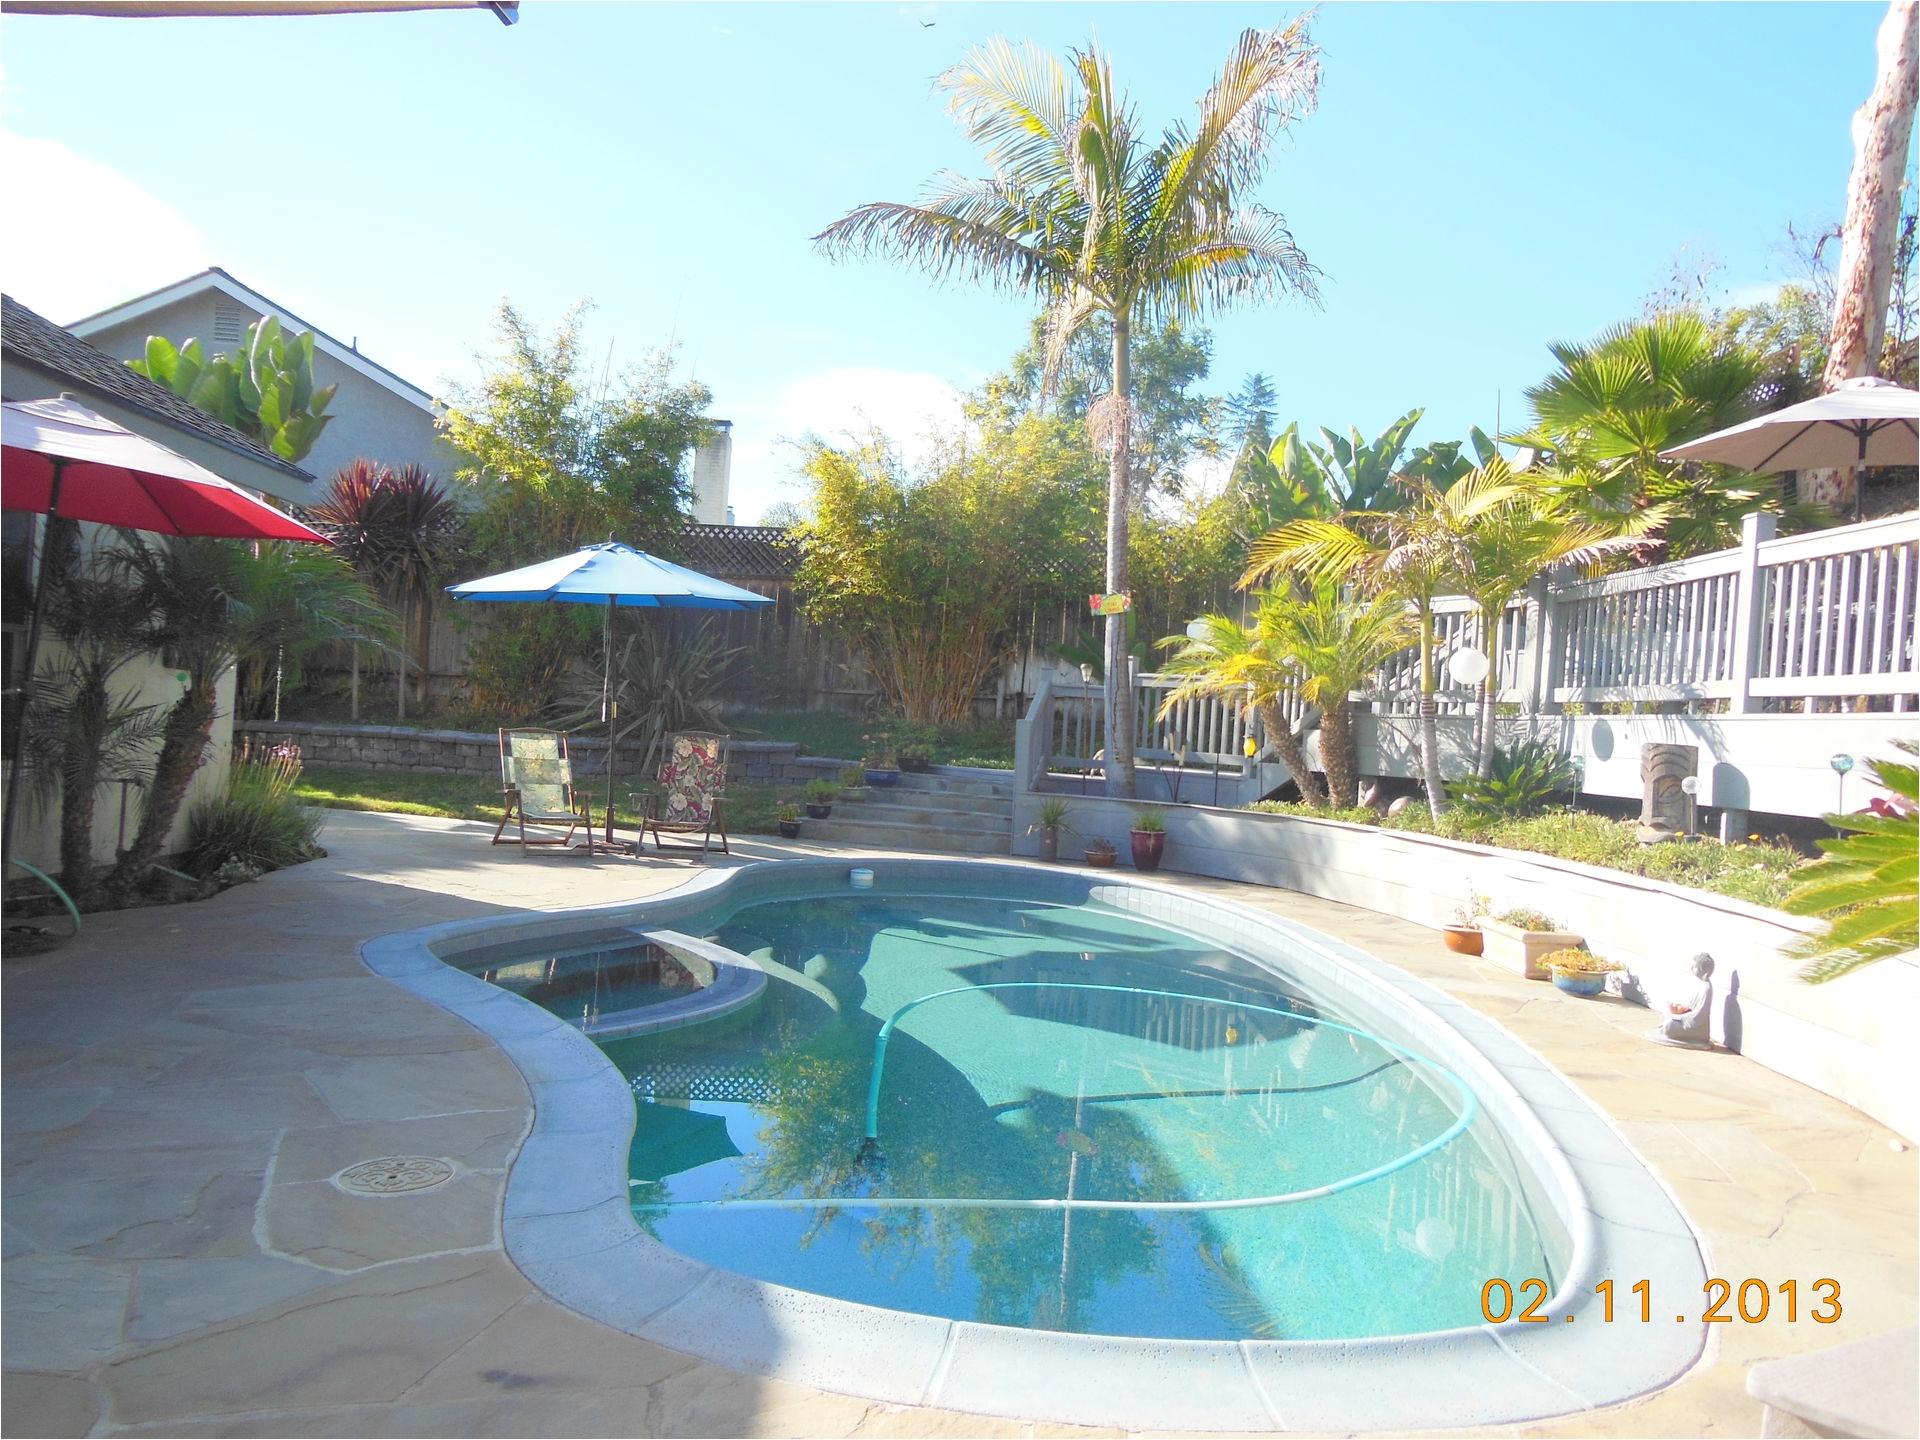 Swimming Pool Floor Padding Tropical Backyard Paradise Bring The Pets Deck Spa Garden